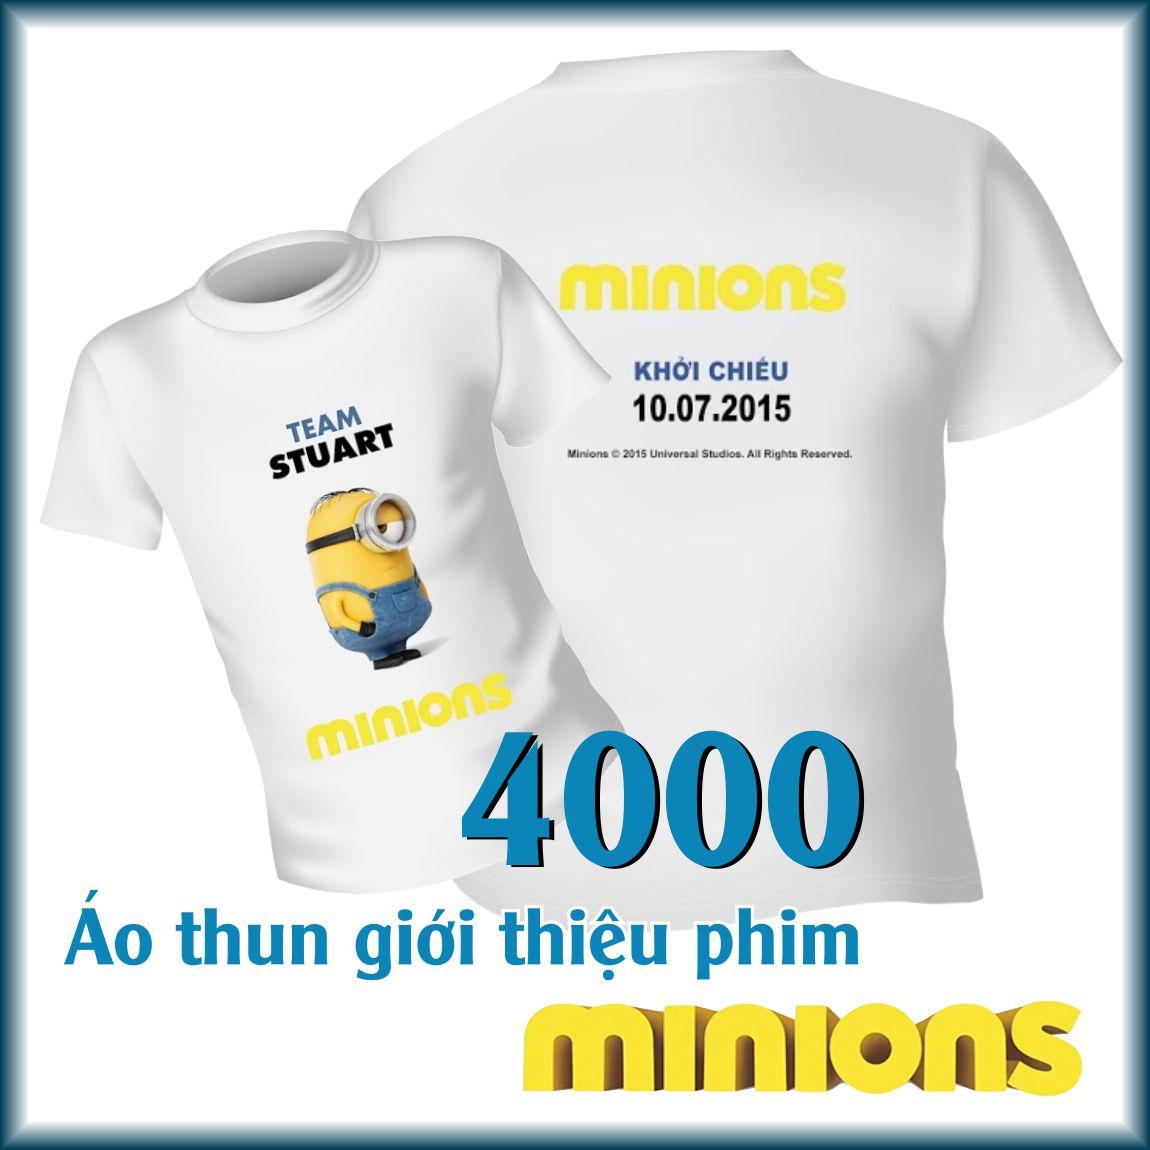 6.Minion